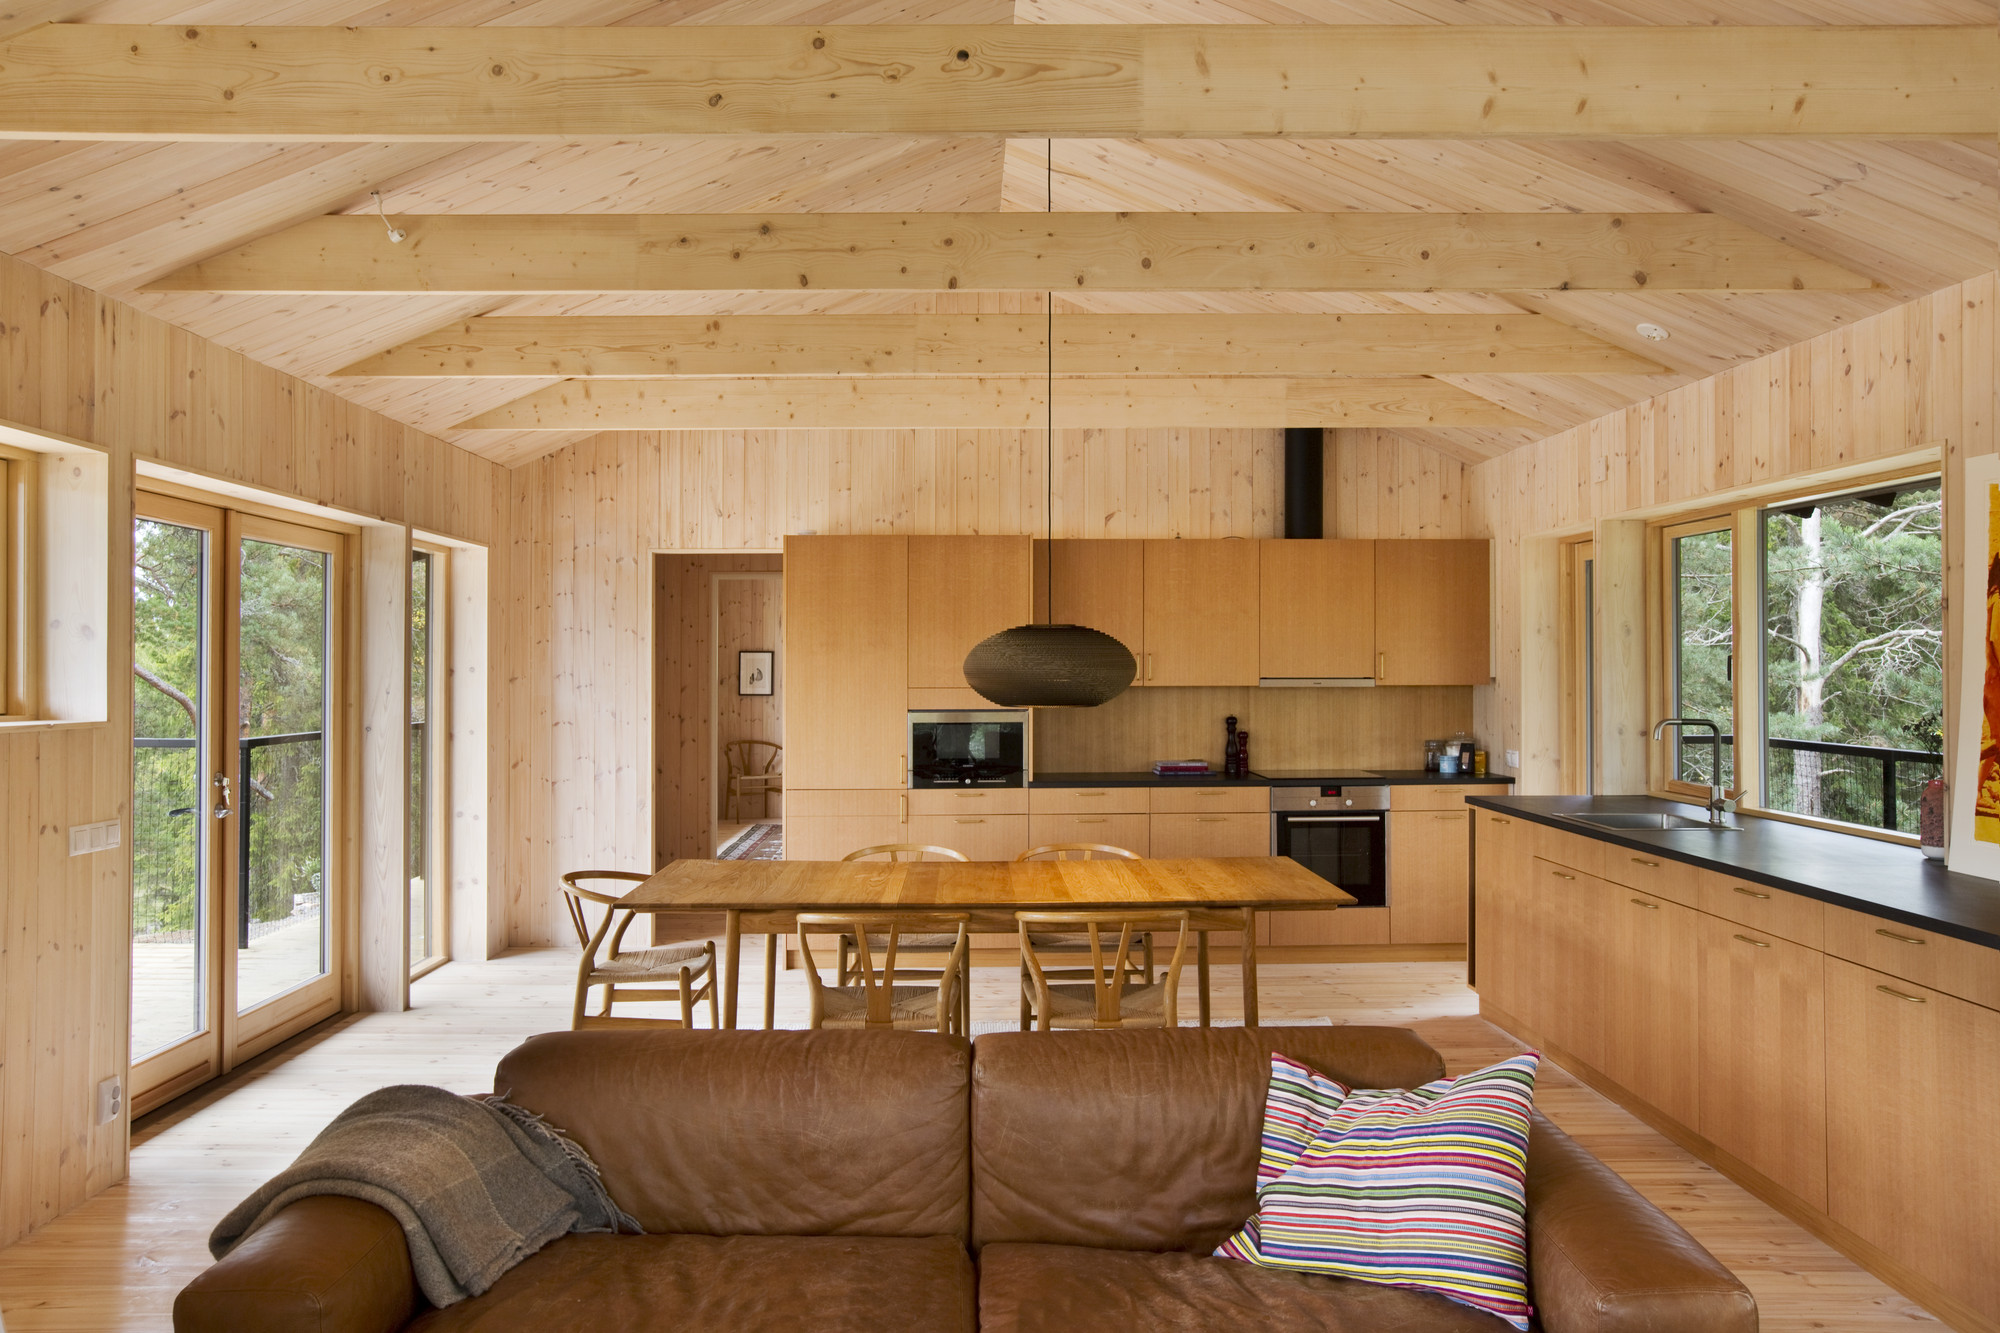 Galeria de casa de veraneio vind max holst 9 - Casas de madera decoracion ...